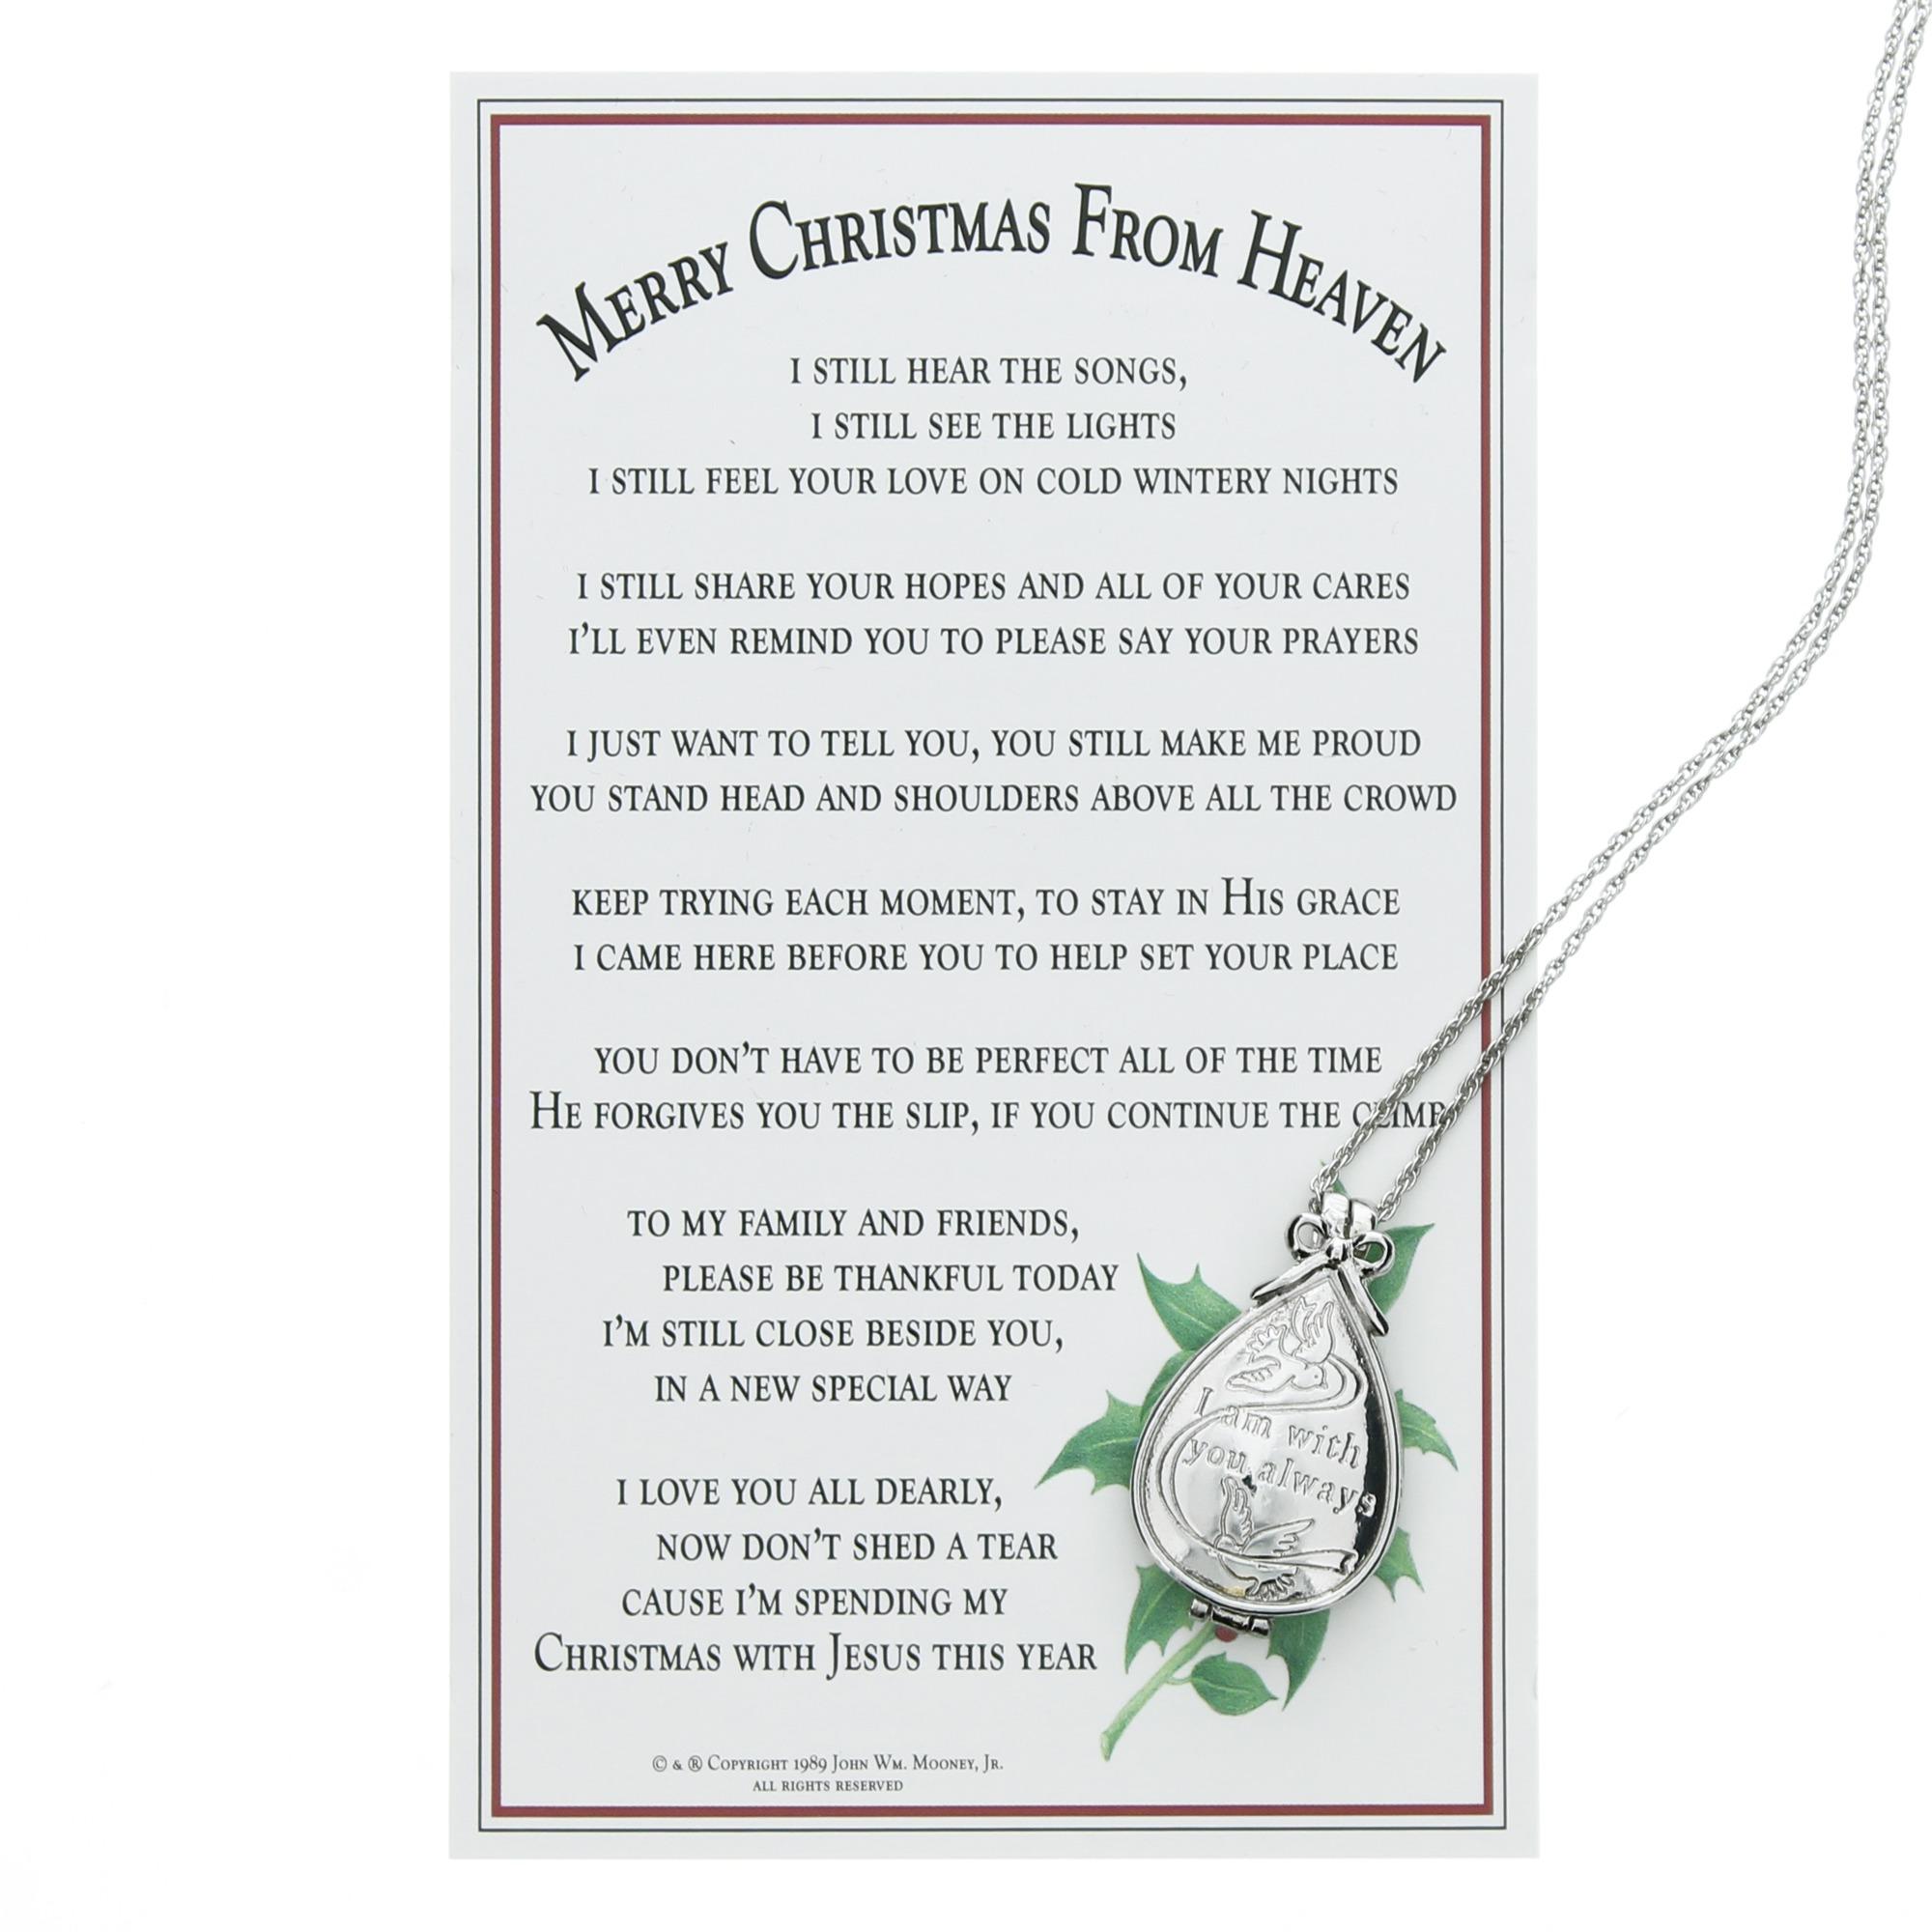 merry christmas from heaven keepsake locket wmemory box